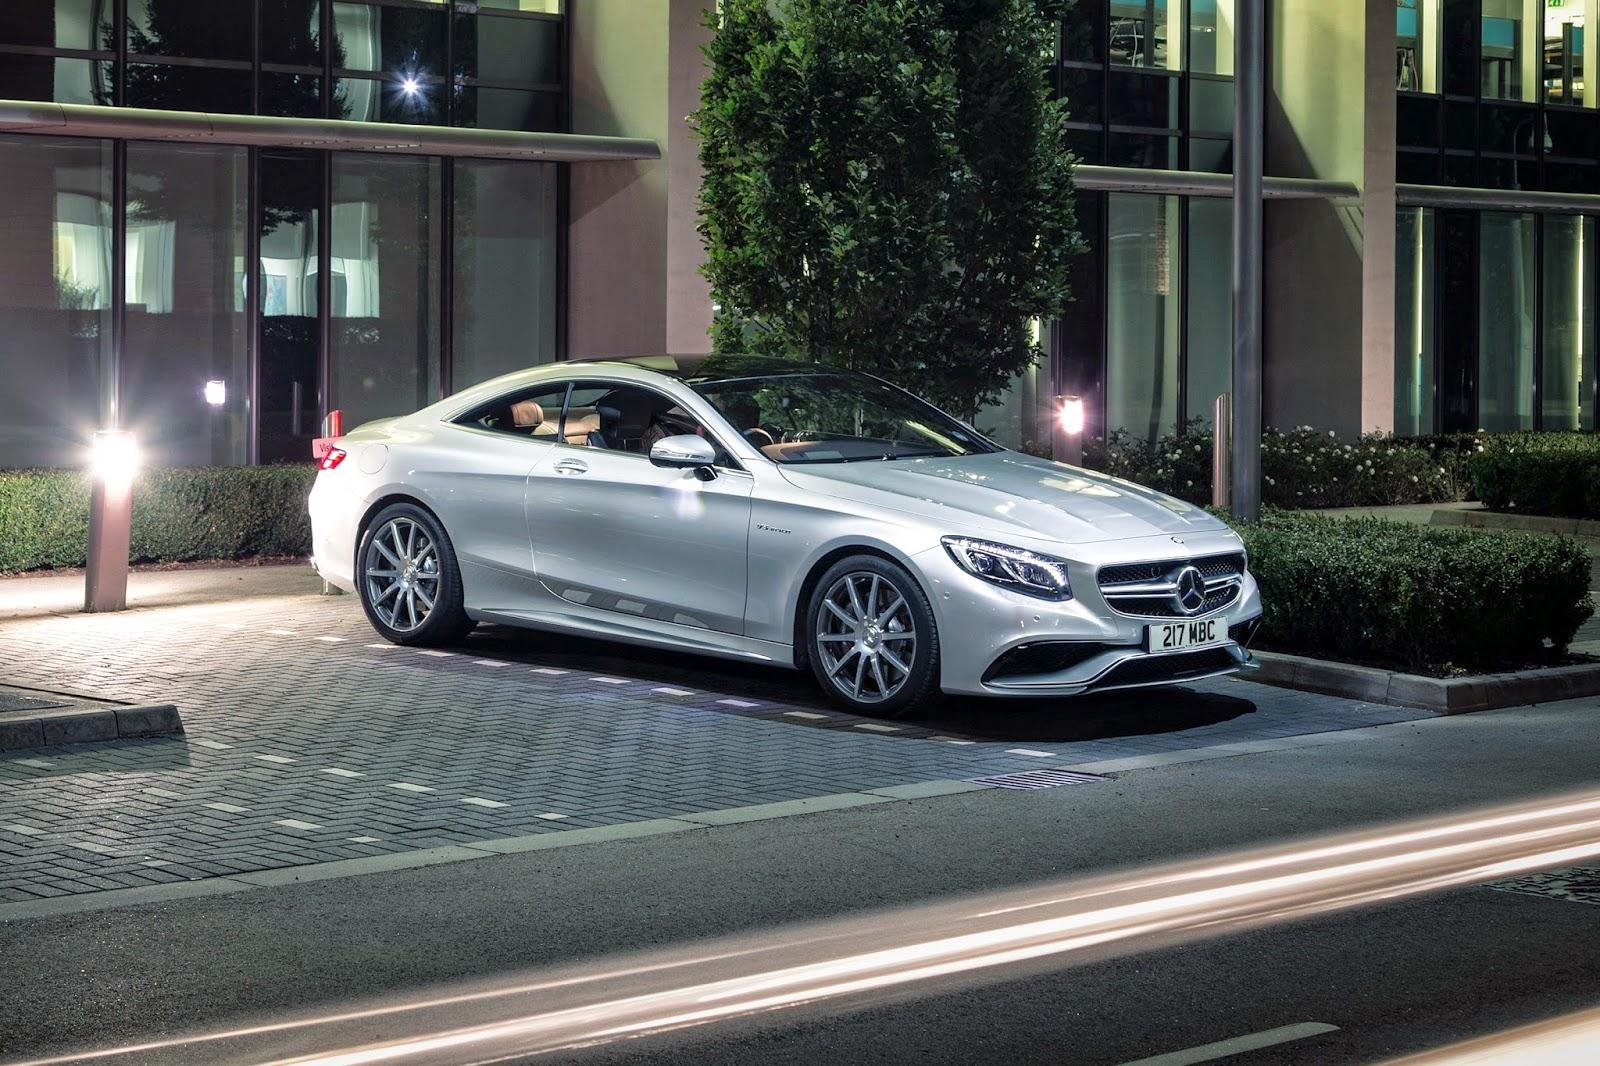 Best car review 100 mercedes benz s class maybach for Mercedes benz s550 maybach